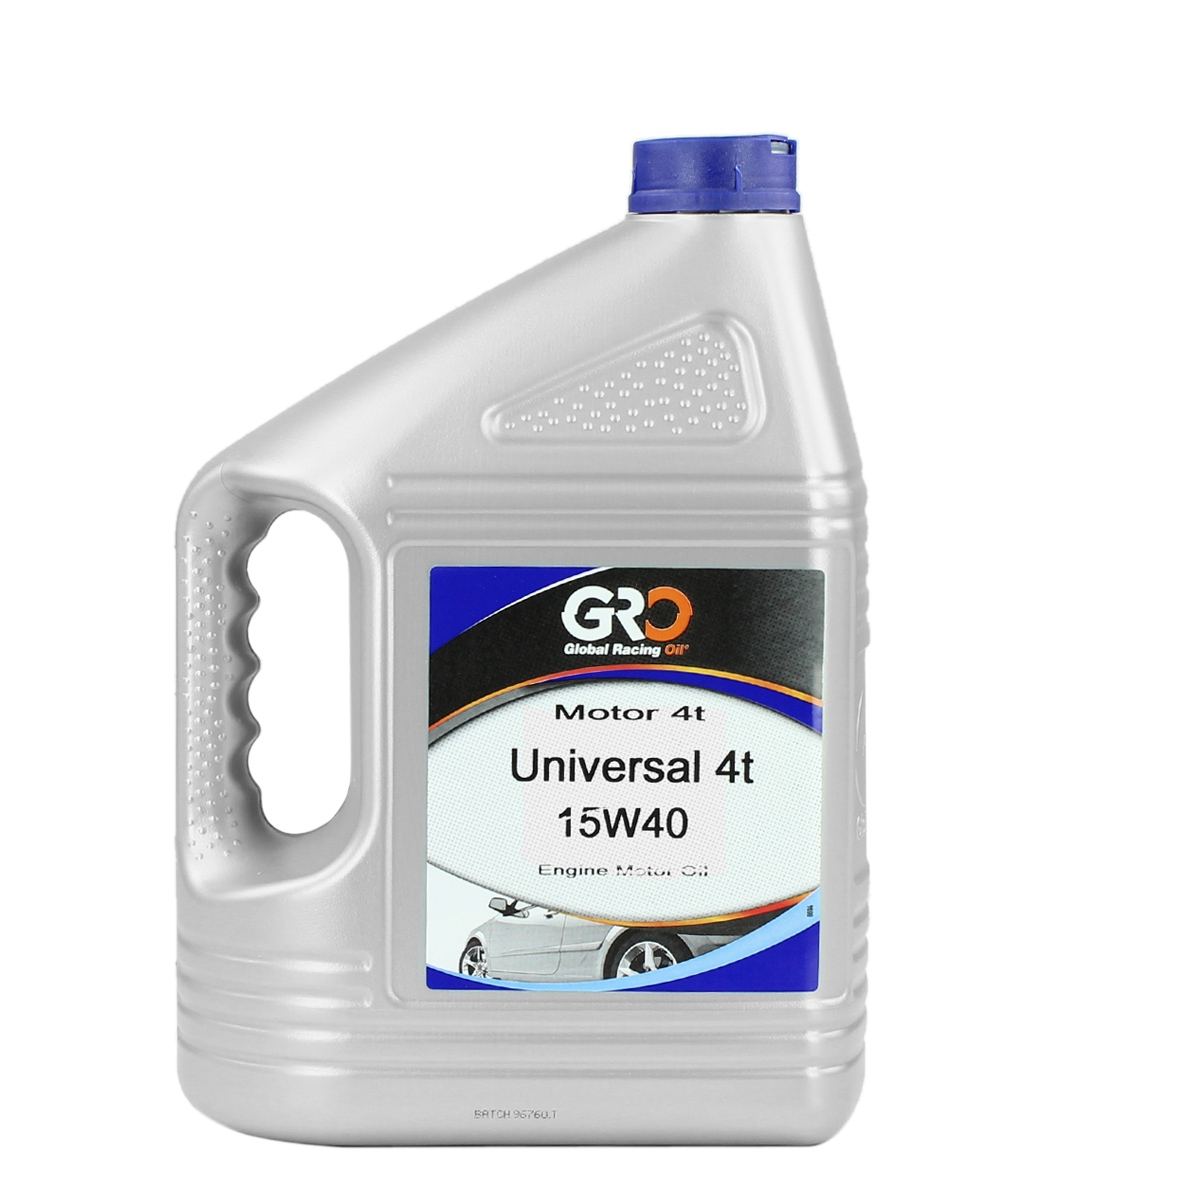 Huile GRO 4t universal 15w40 5L